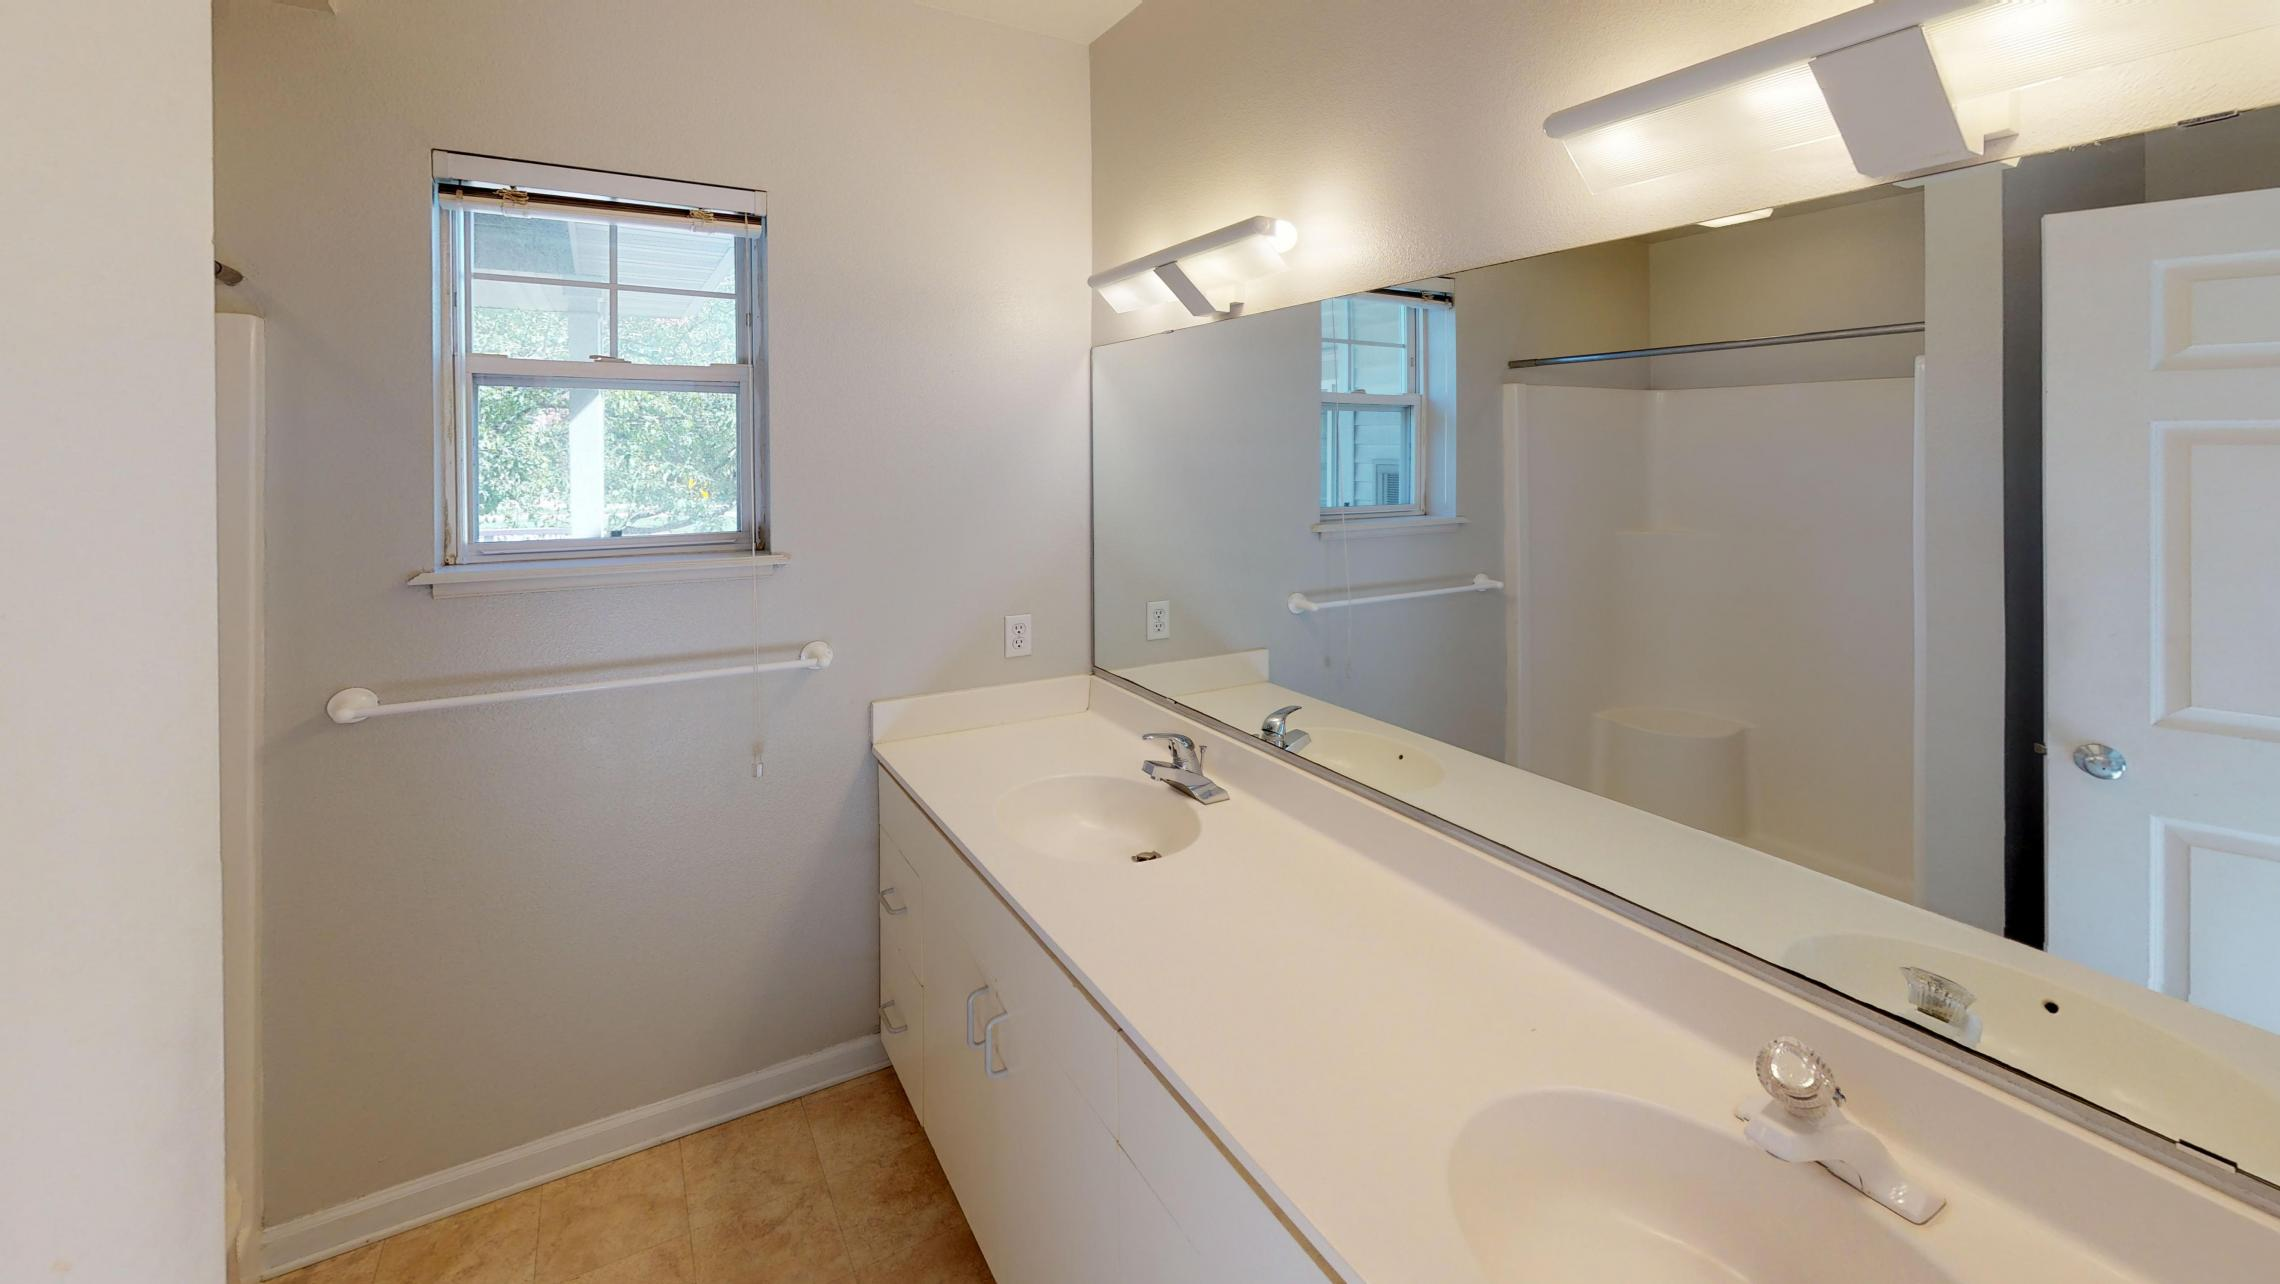 Wilson-Bay-Apartment-112-Two-Bedroom-Downtown-Madison-Master-Bathroom-Double-Sinks-Corner-Window.jpg